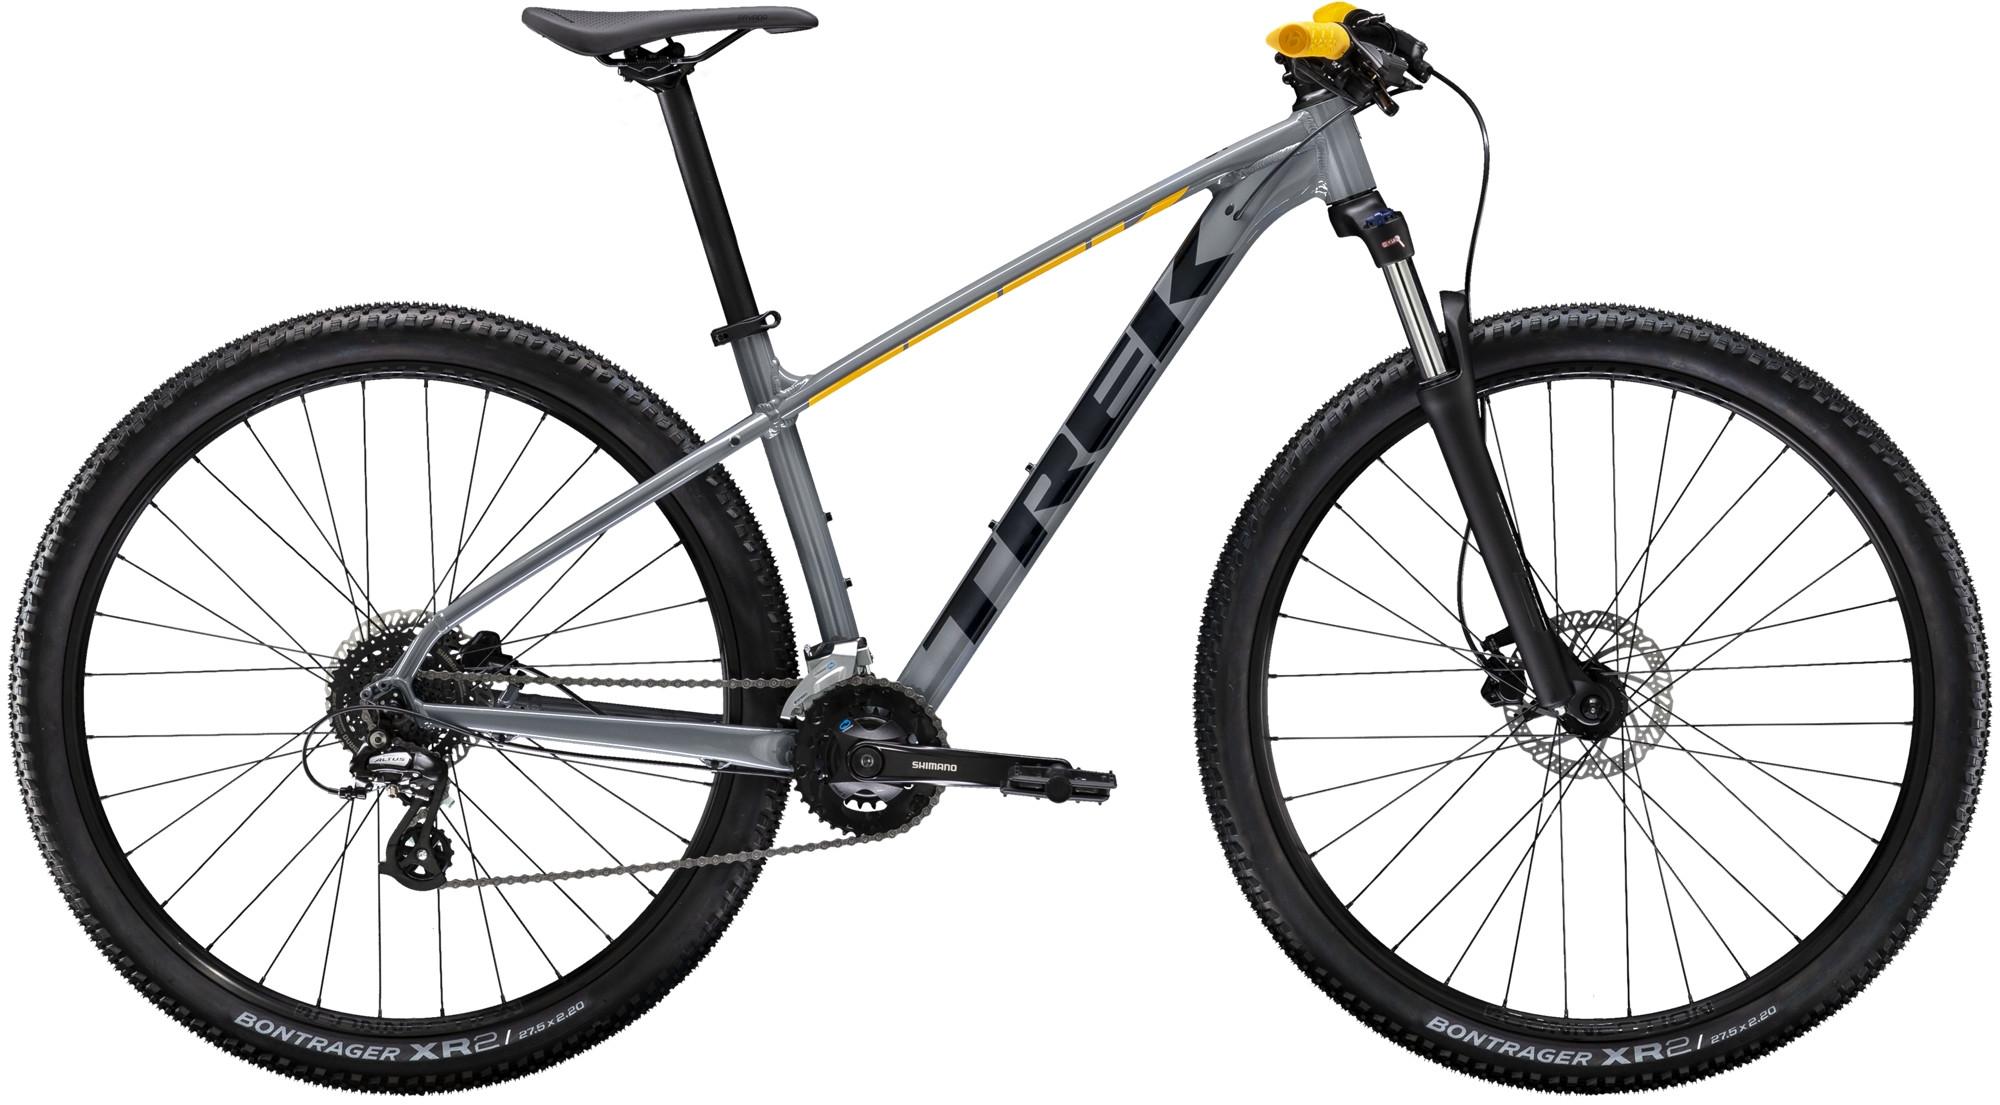 2020 Trek Marlin 6 Bikes